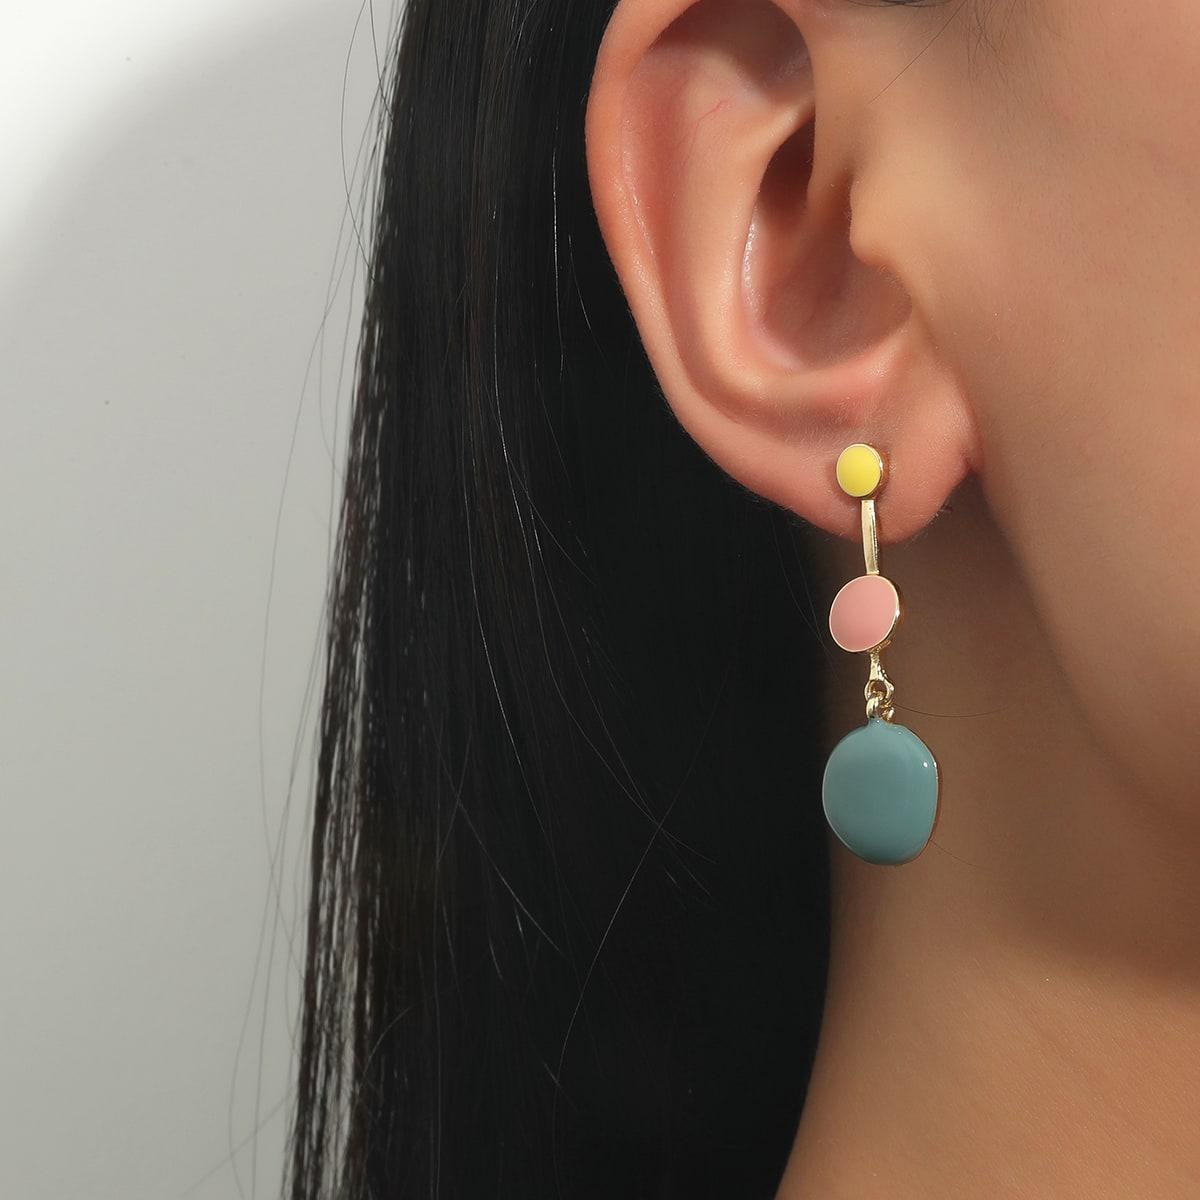 Round Decor Earrings